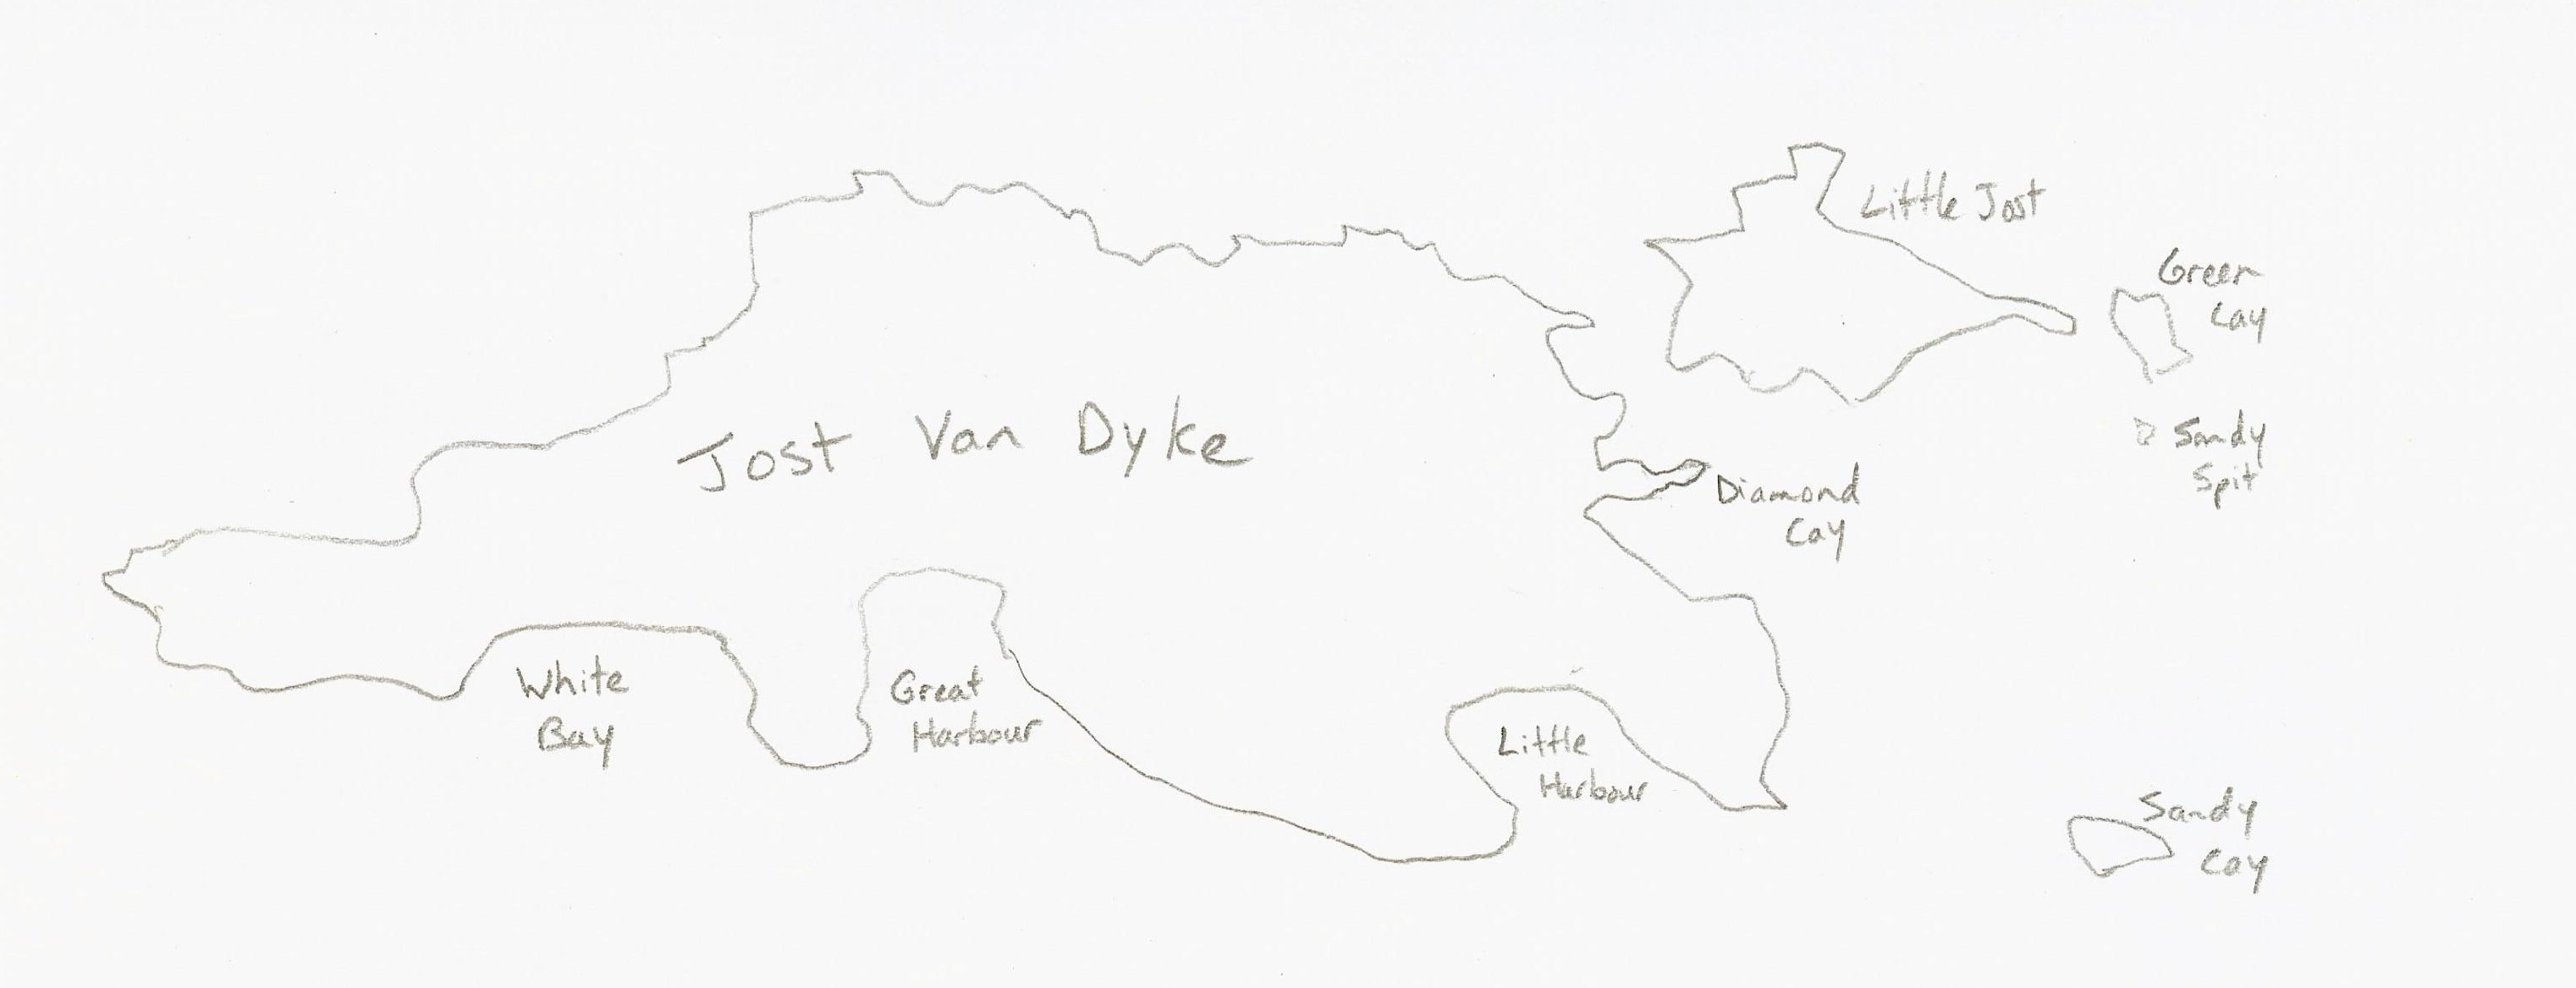 Jost Van Dyke BVI Bound